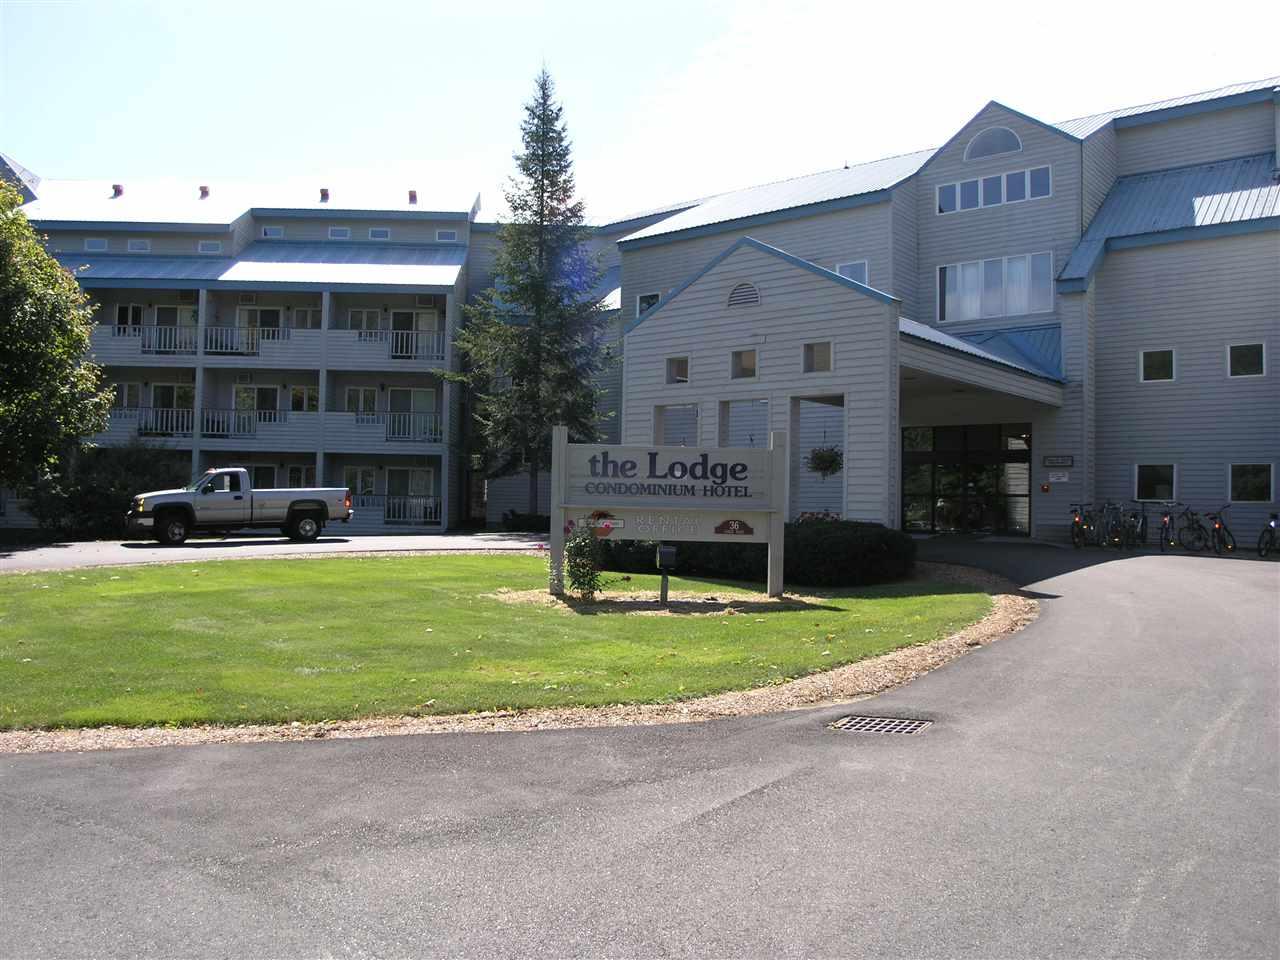 36 Lodge unit C-108 Road, Lincoln, NH 03251